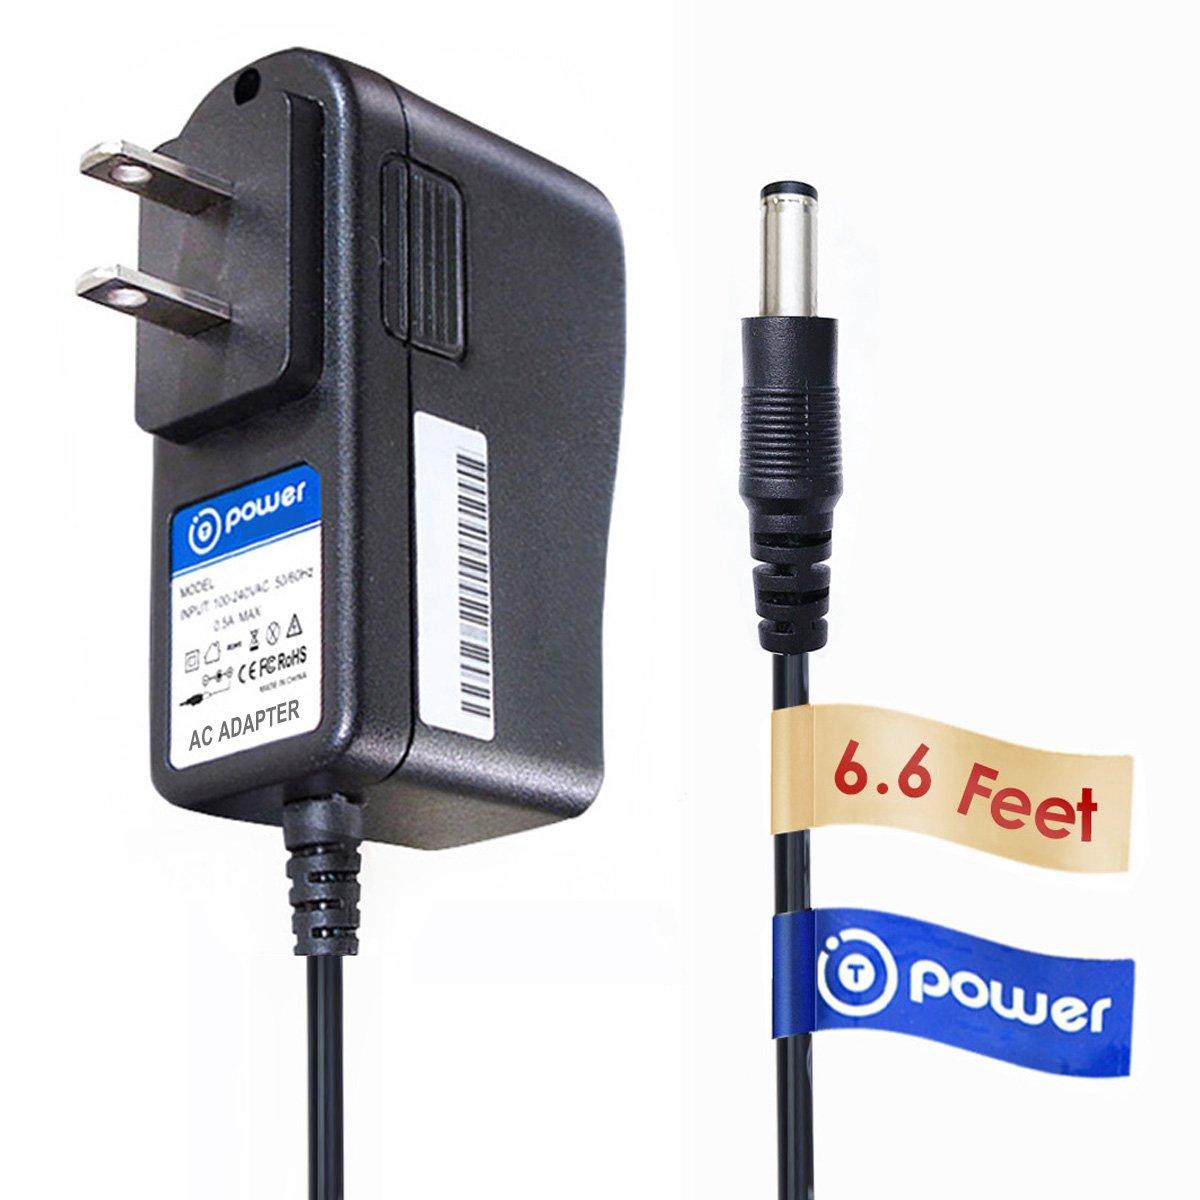 T-Power (6.6ft Long Cable) for Kaito Voyager Pro AD500 KA007 KA008 KA009 KA600 KA500 Digital Solar Dynamo Hand Crank Radio Digital Emergency AC DC Adapter